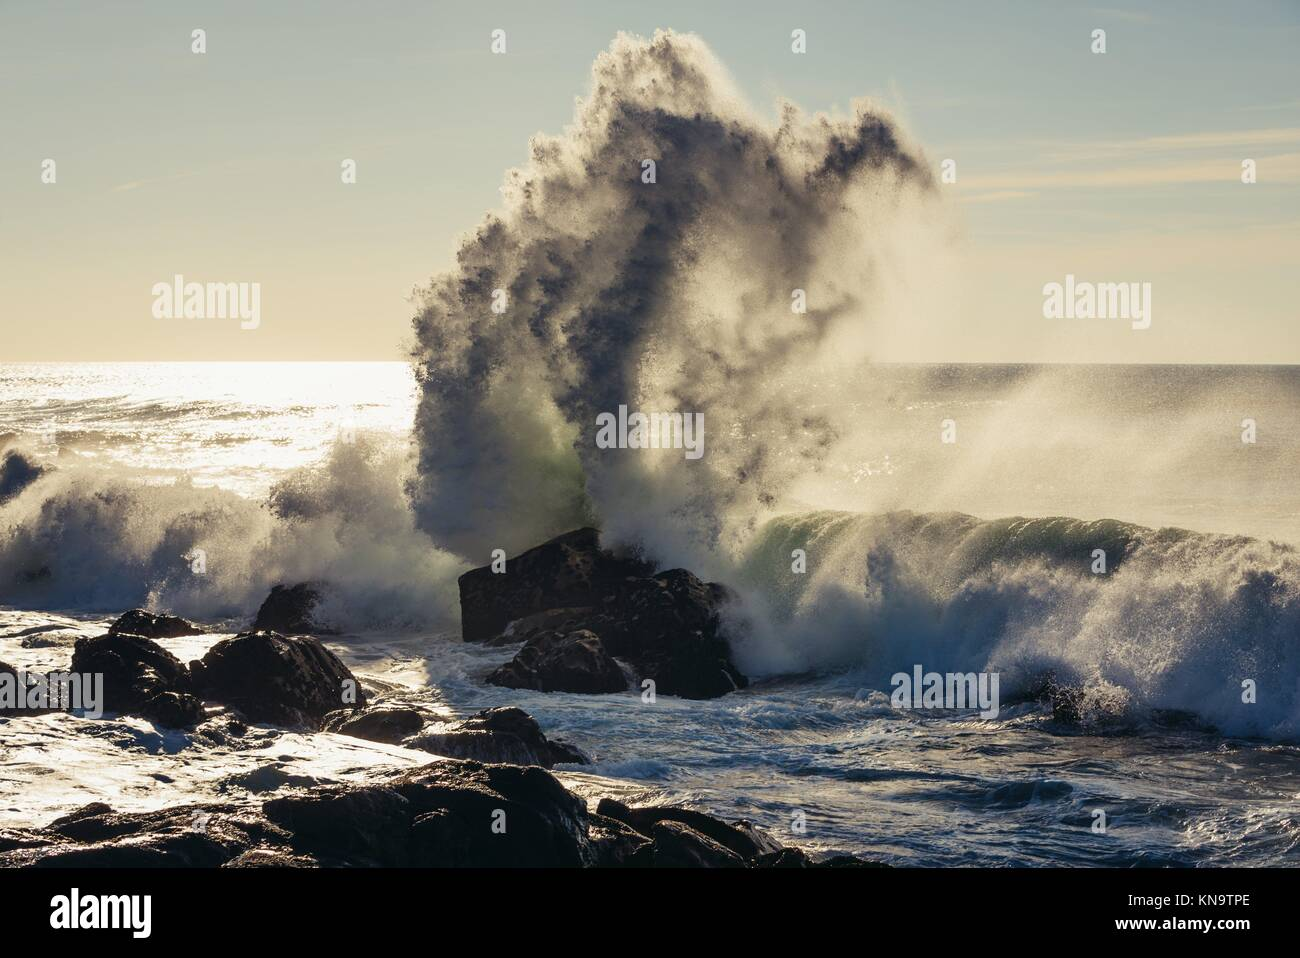 Big waves smashing on rocks of Atlantic Ocean shore in Nevogilde civil parish of Porto, second largest city in Portugal. - Stock Image